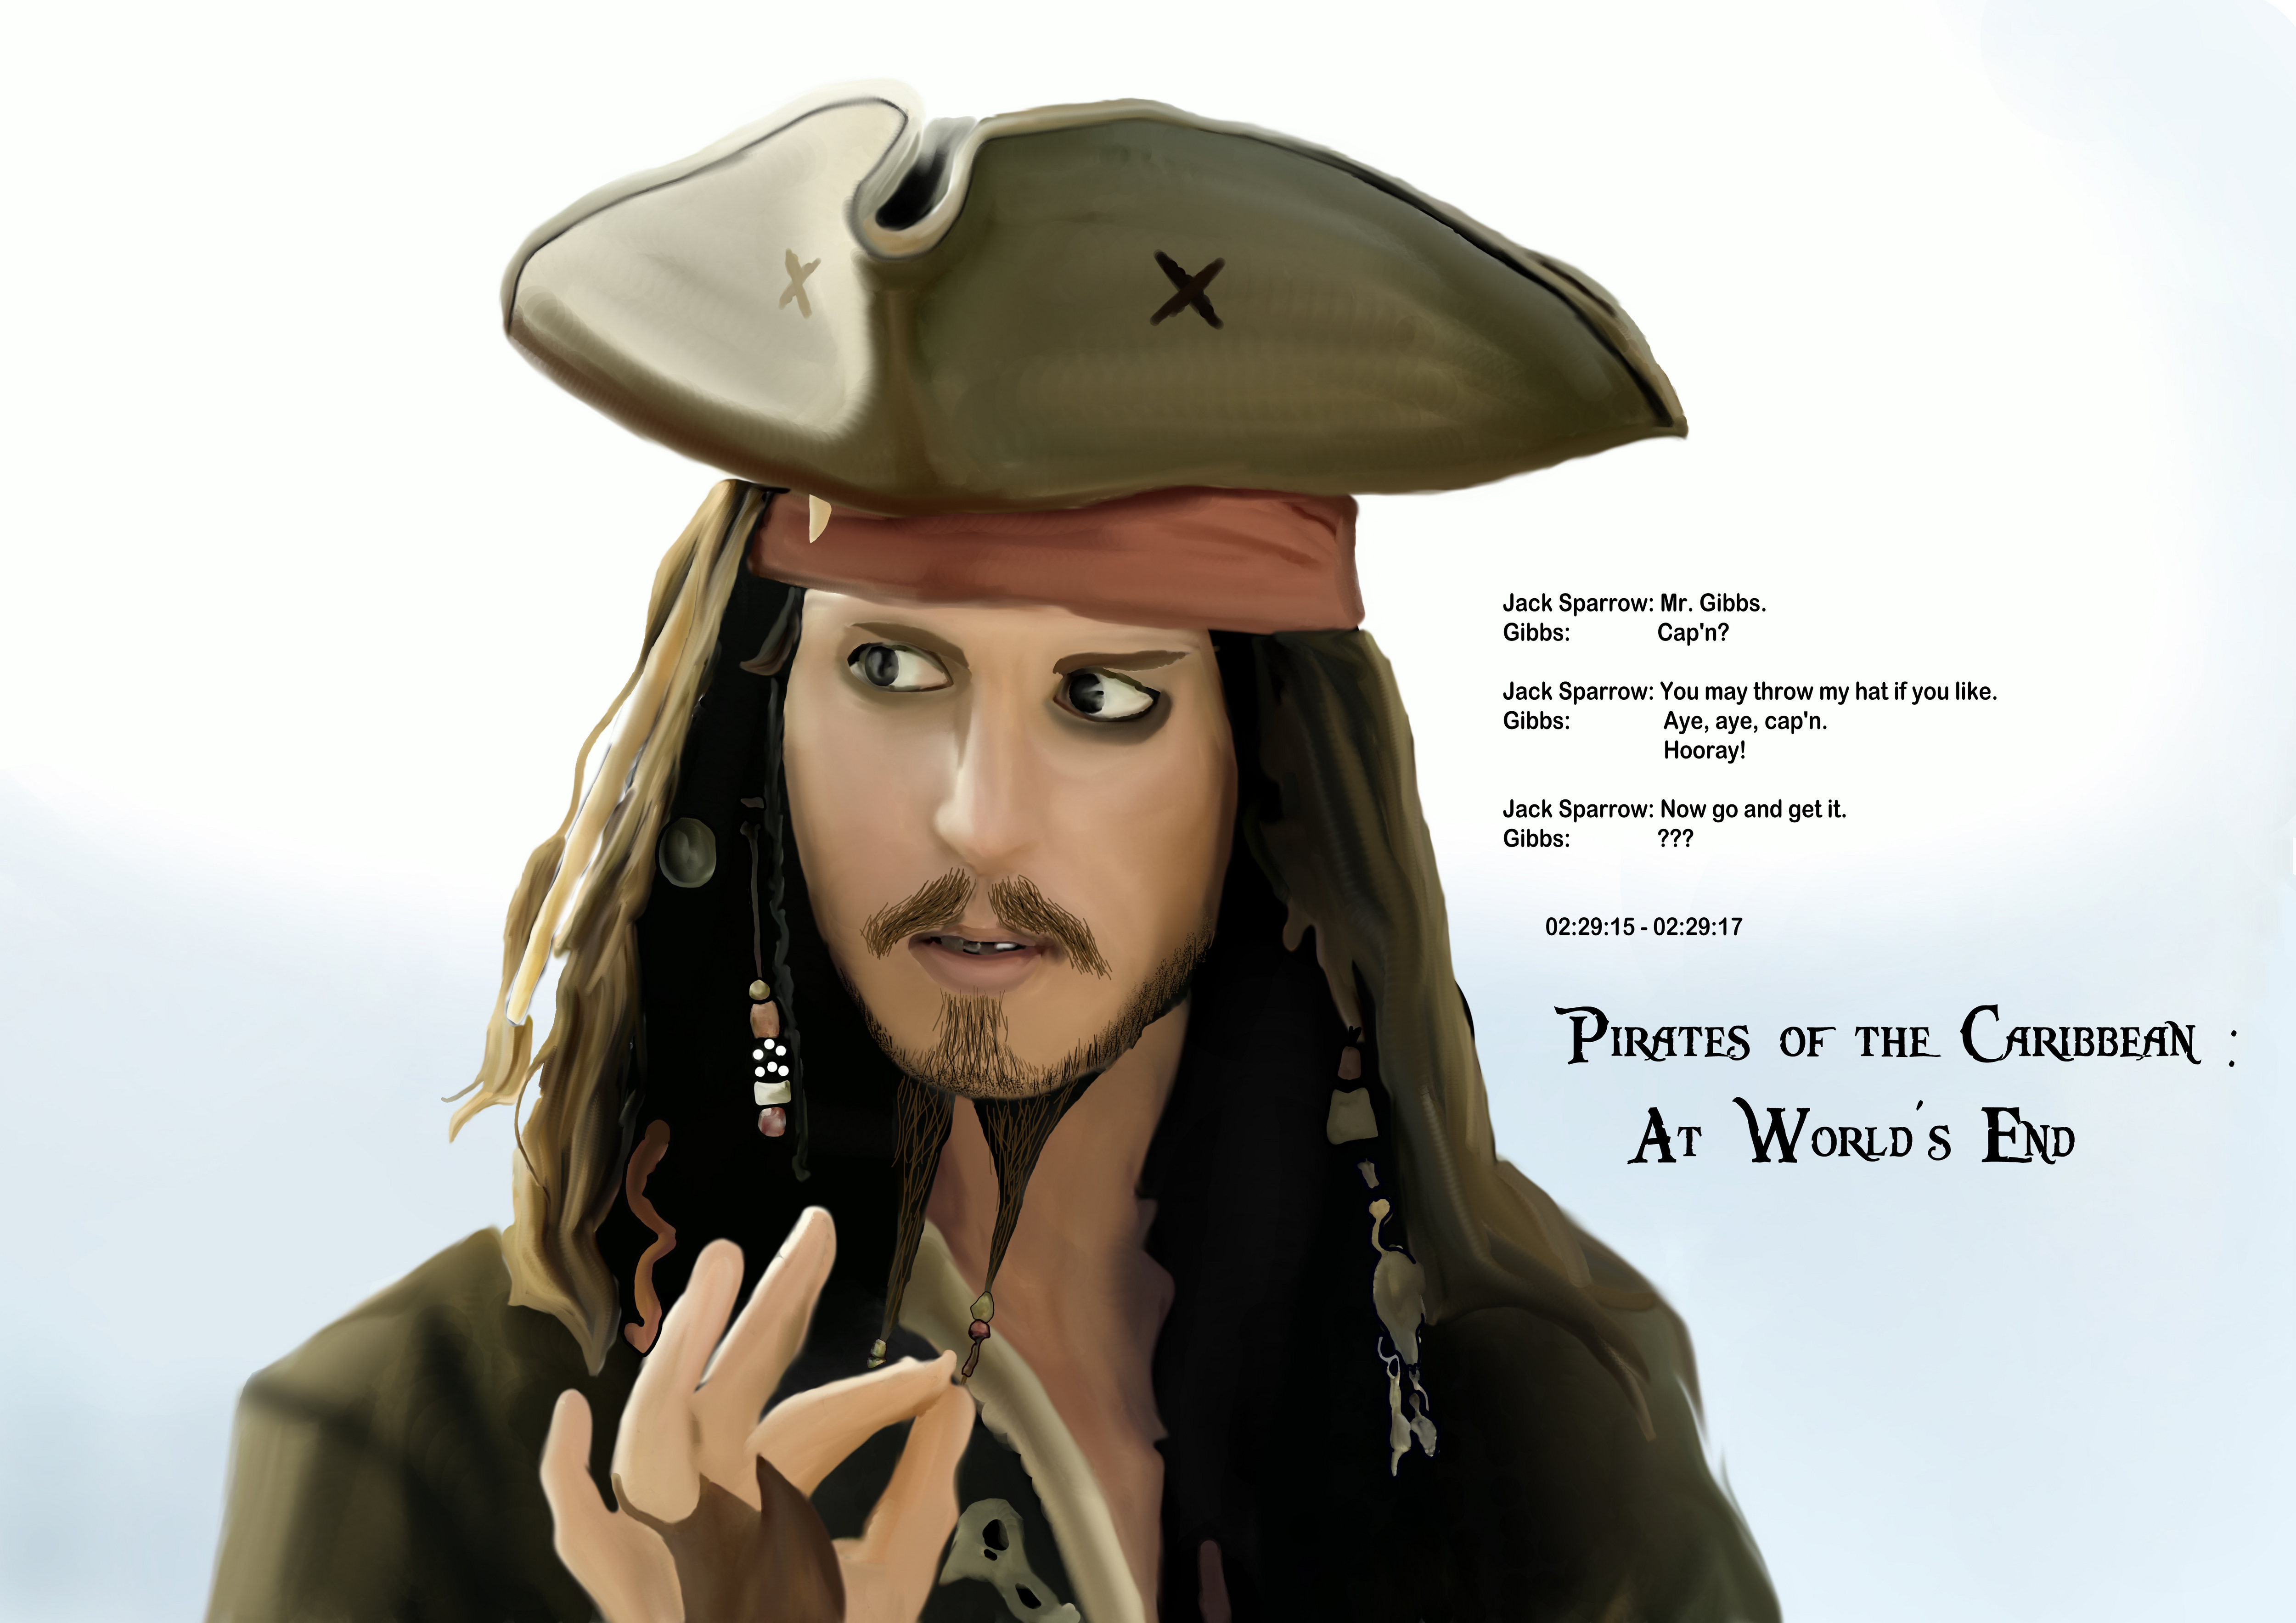 piratas del caribe imágenes  Jack Sparrow  HD fondo de pantalla and ... f8110325428